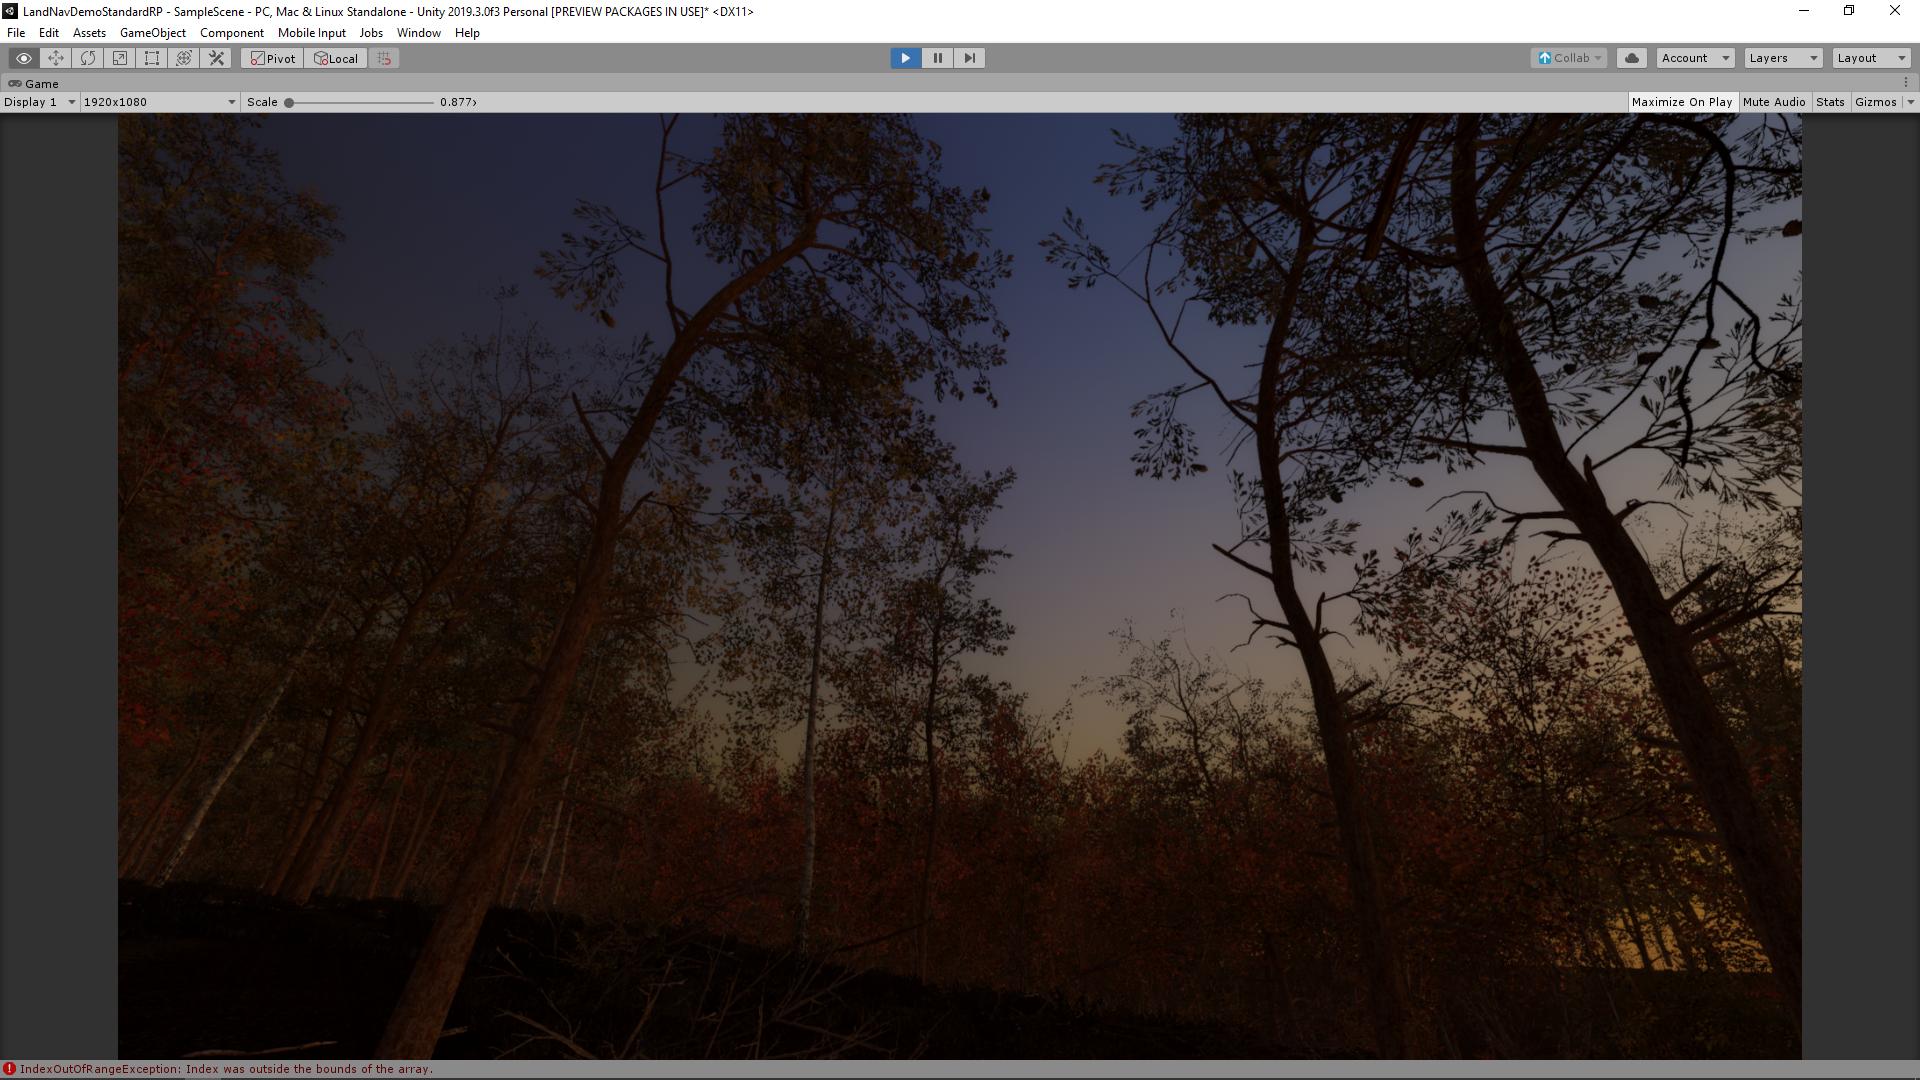 Desktop Screenshot 2020.01.05 - 23.15.58.79.png